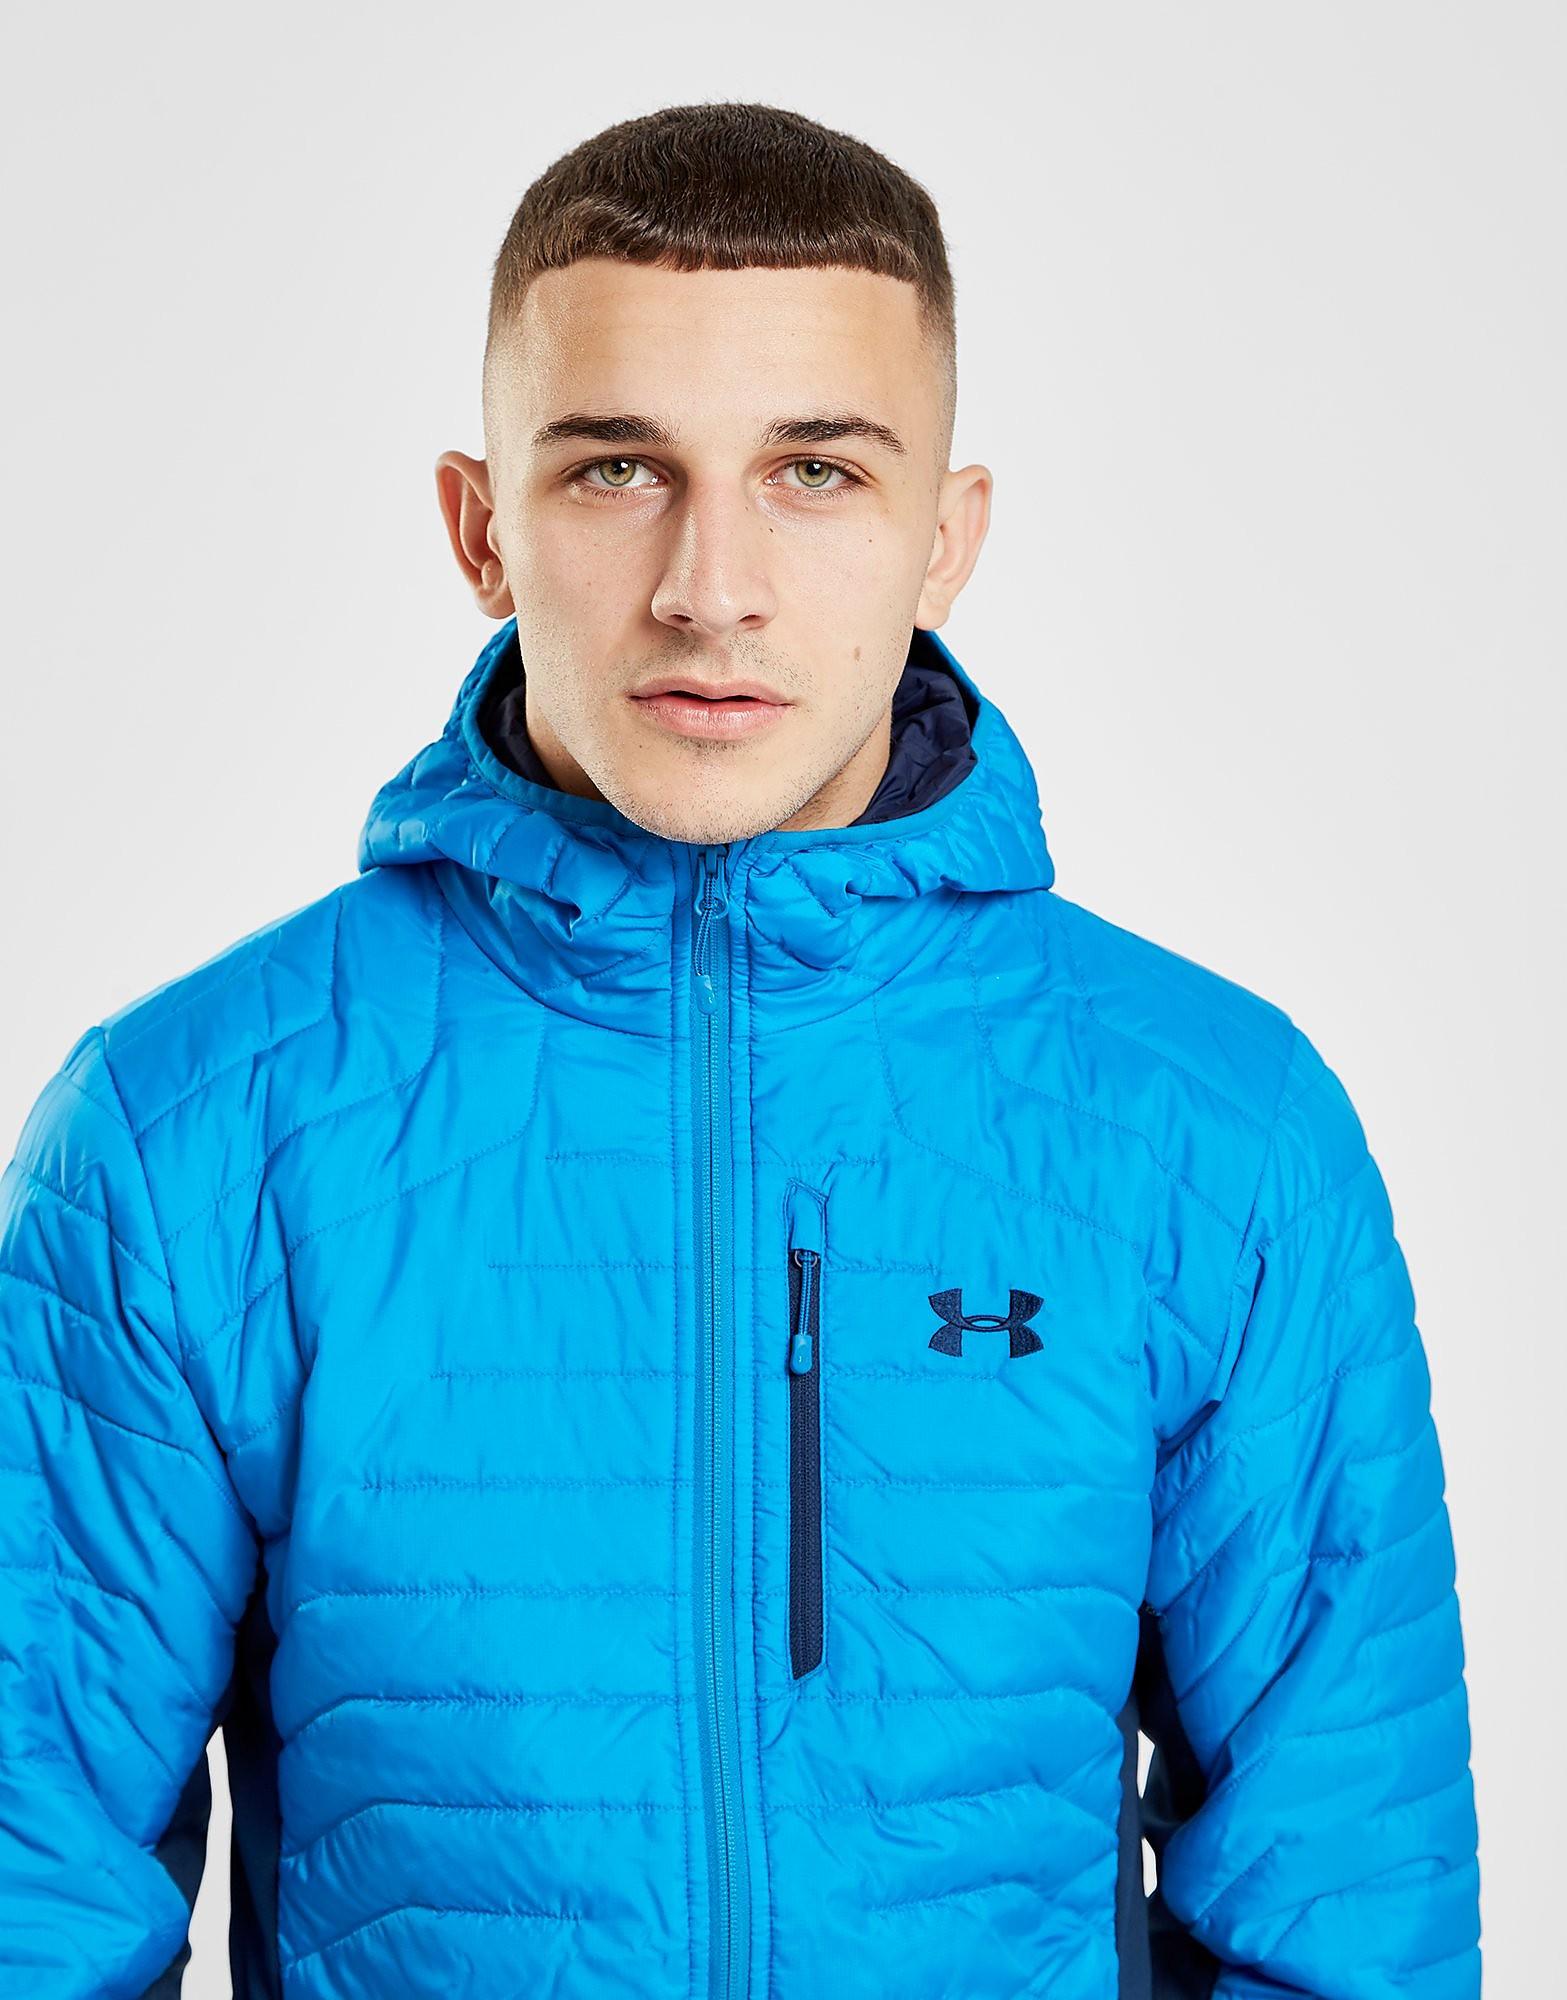 Under Armour ColdGear Hybrid Jacket - Blau - Mens, Blau